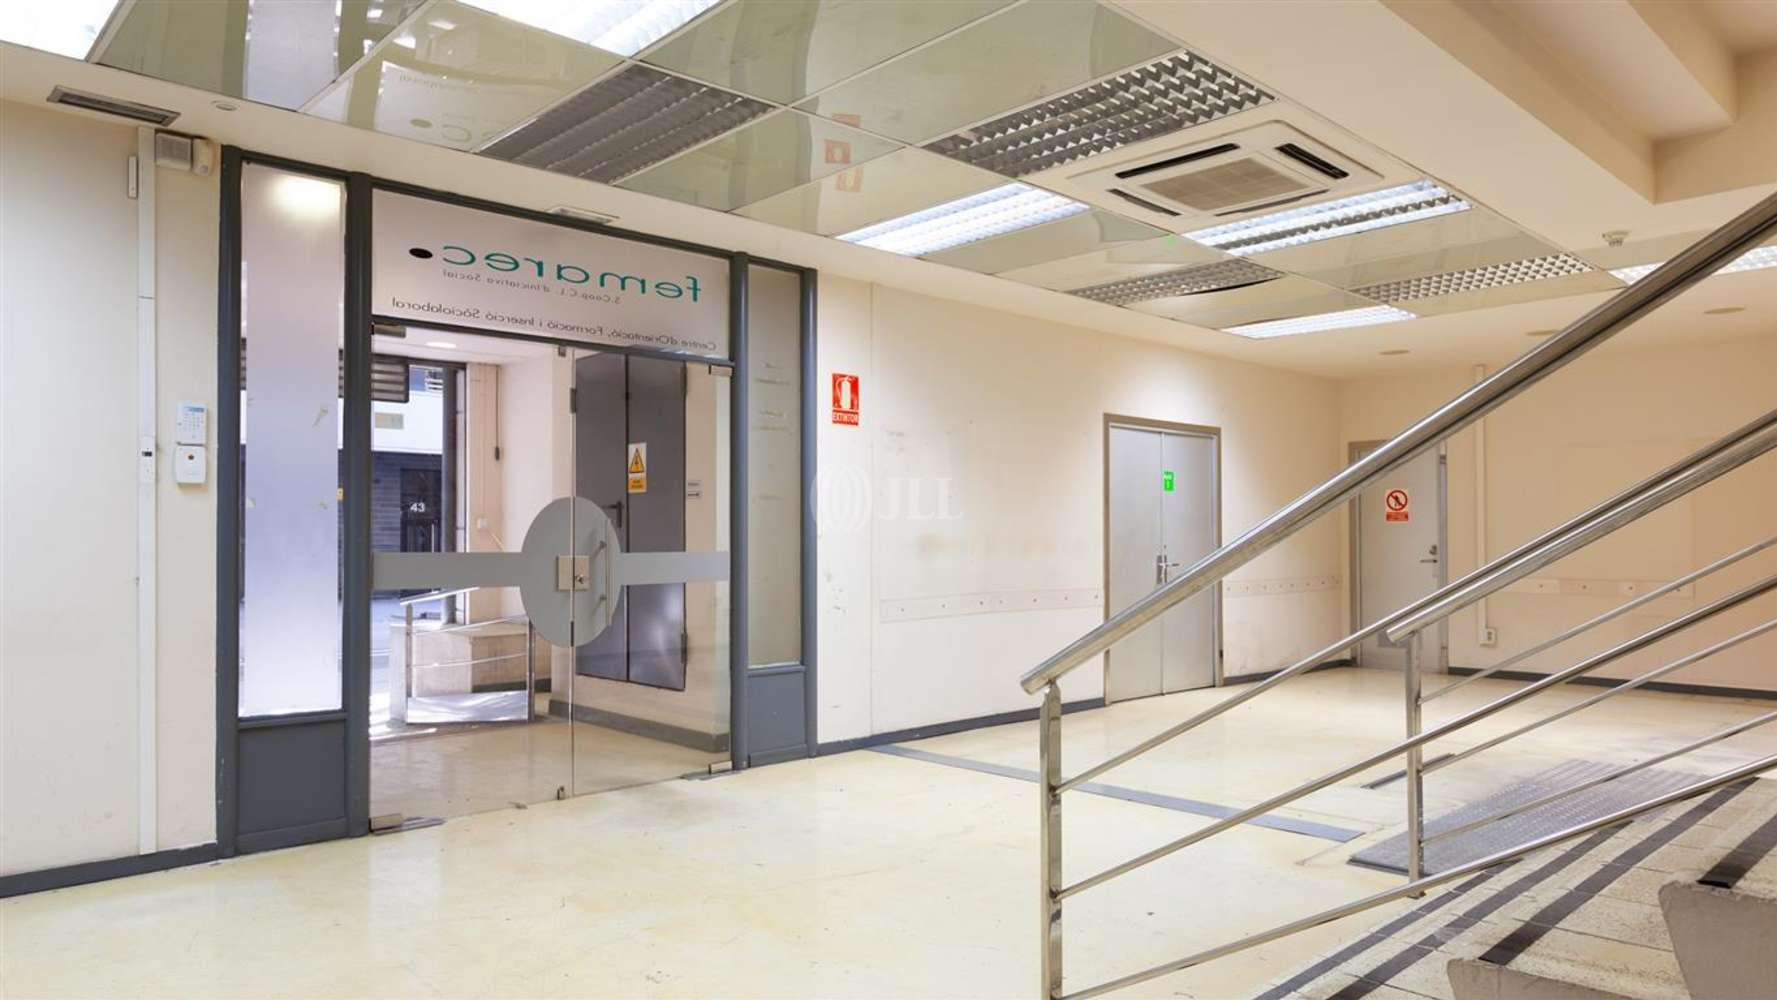 Local comercial Barcelona, 8005 - SARDENYA 68-72